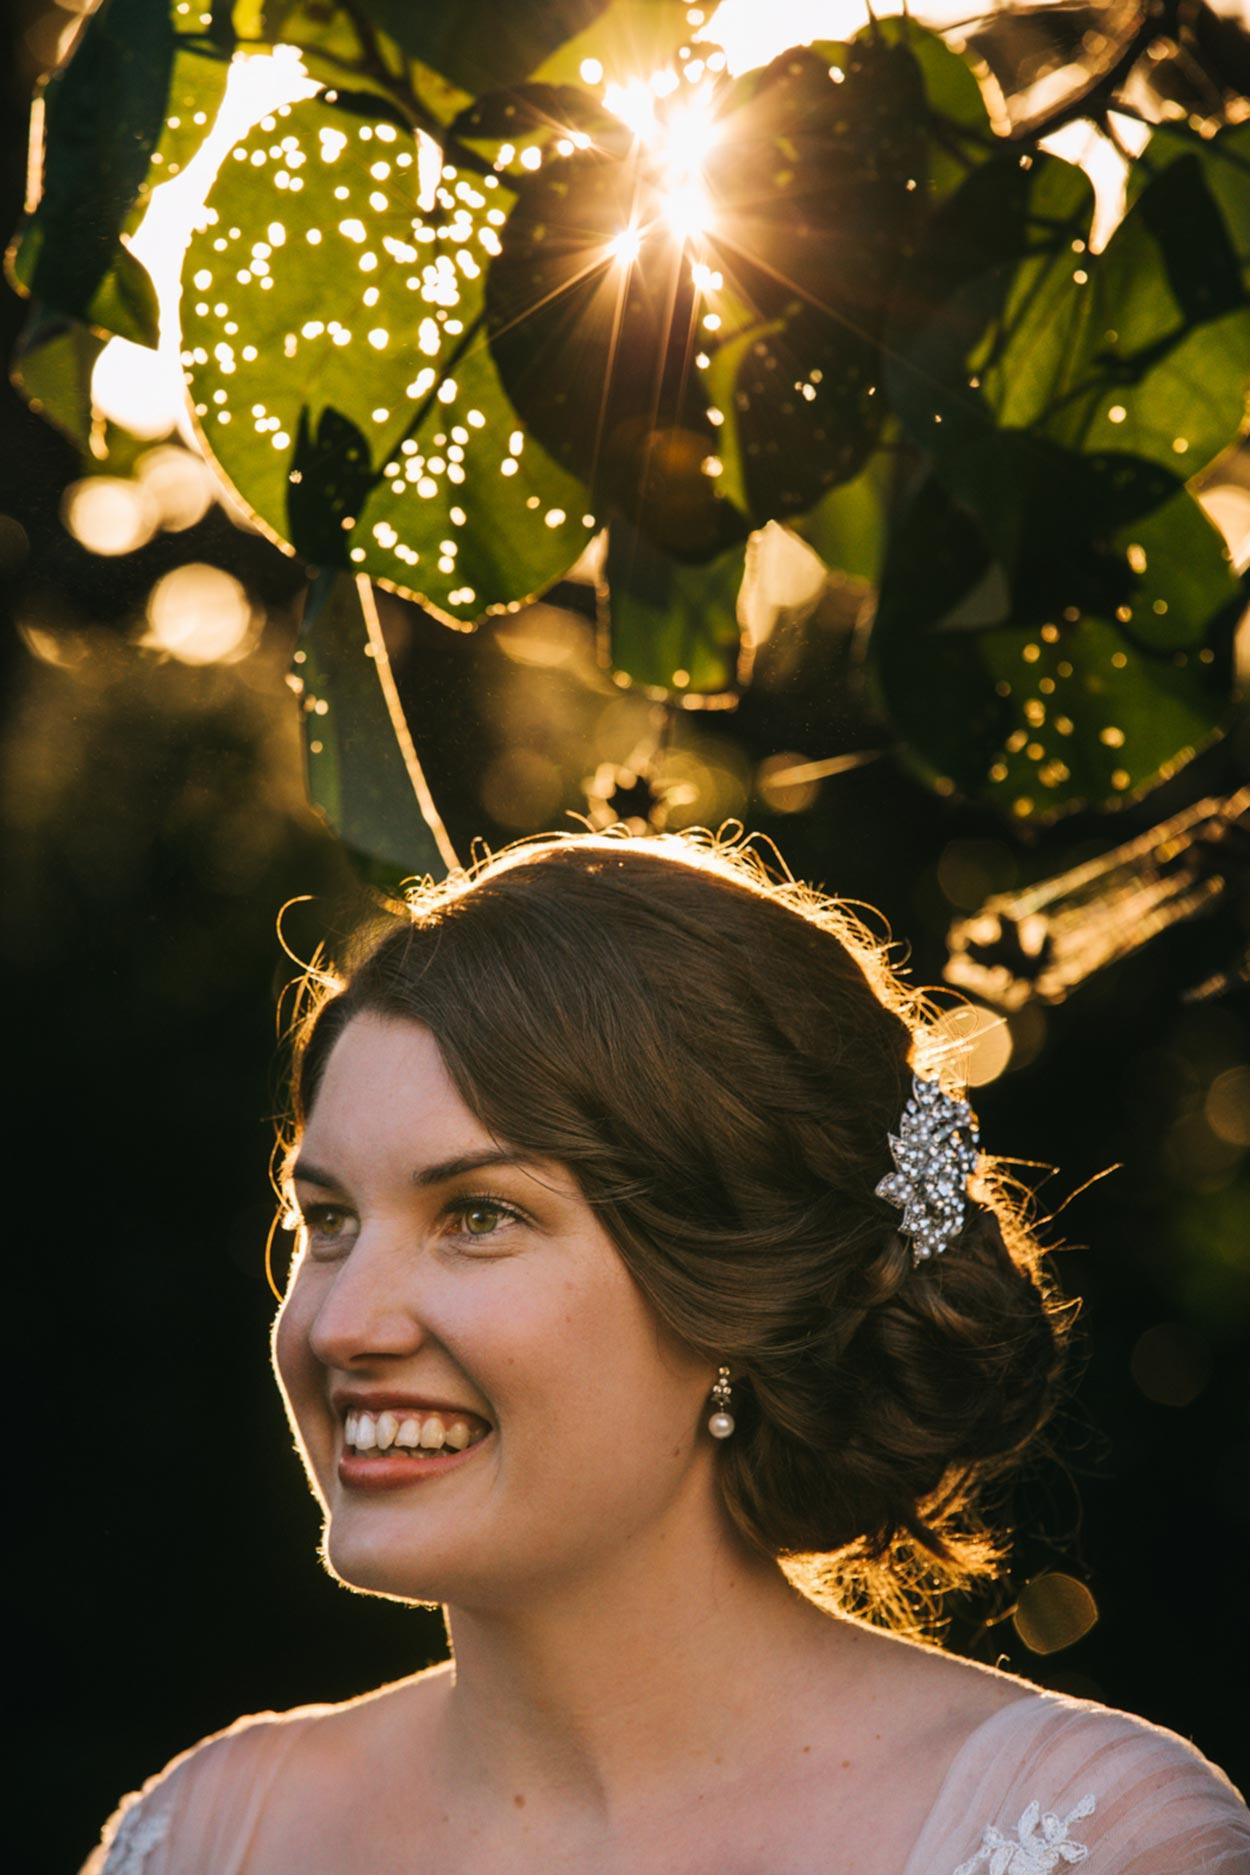 sunshine-coast-wedding-photographers-noosa-maleny-mooloolaba-maroochydore-glasshouse-mountains-hinterland-best-eco-friendly-photos-brisbane-queensland-australia-034.jpg